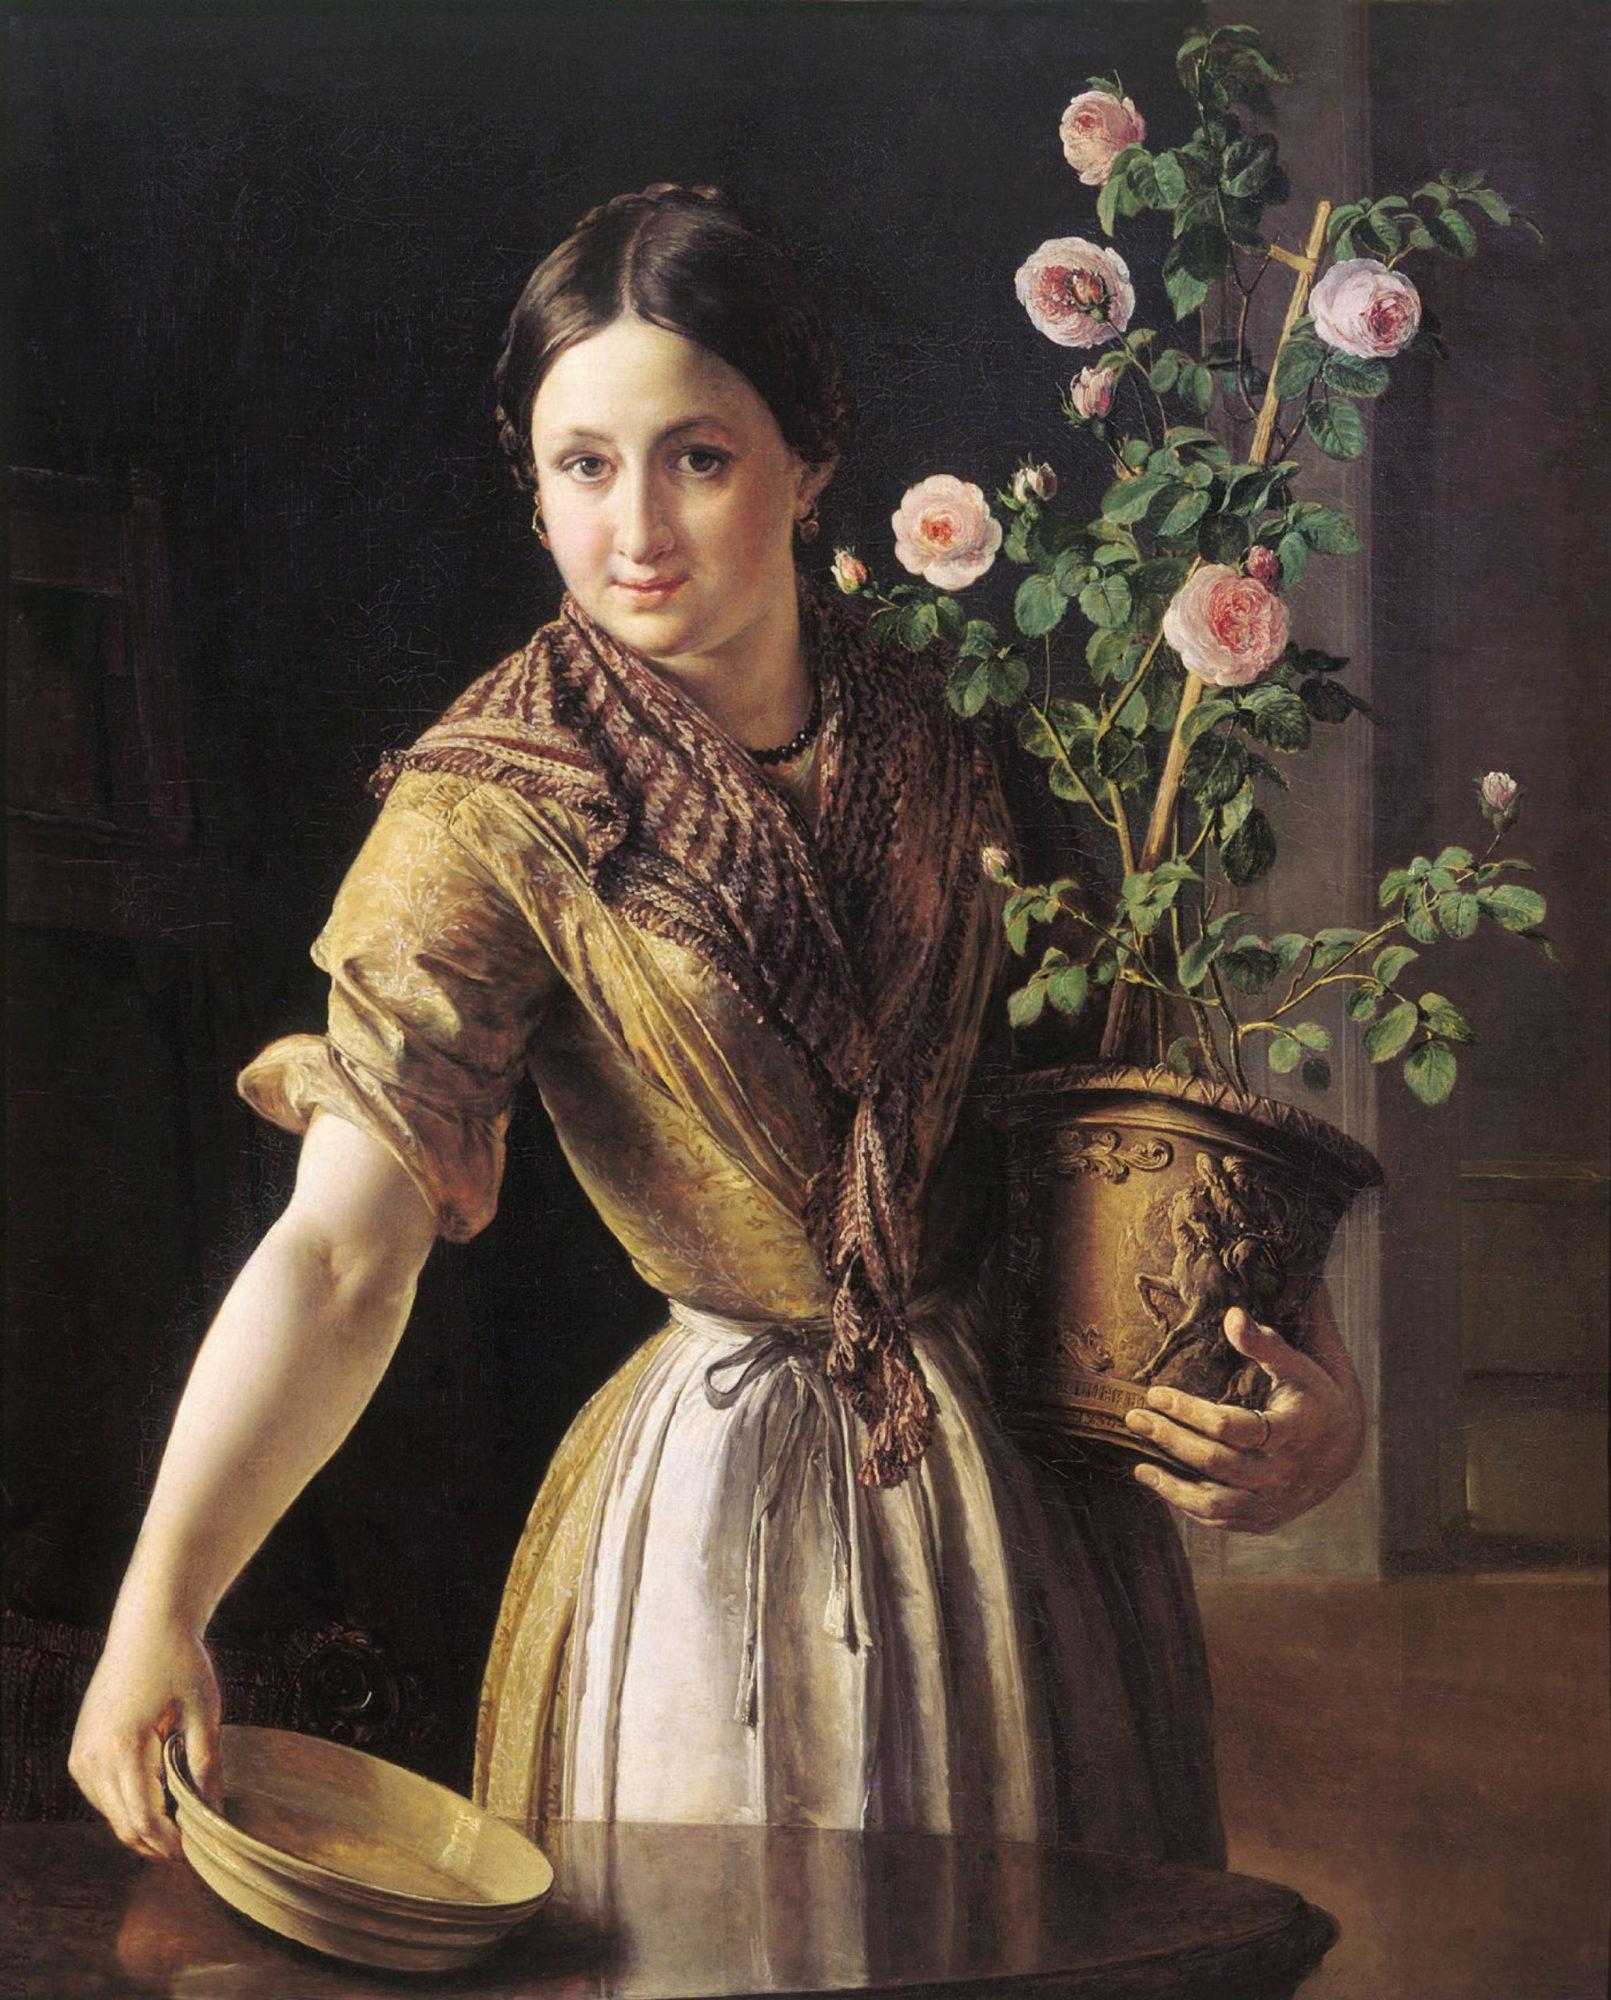 Василий Тропинин, 1850 год, картина «Девушка с горшком роз».